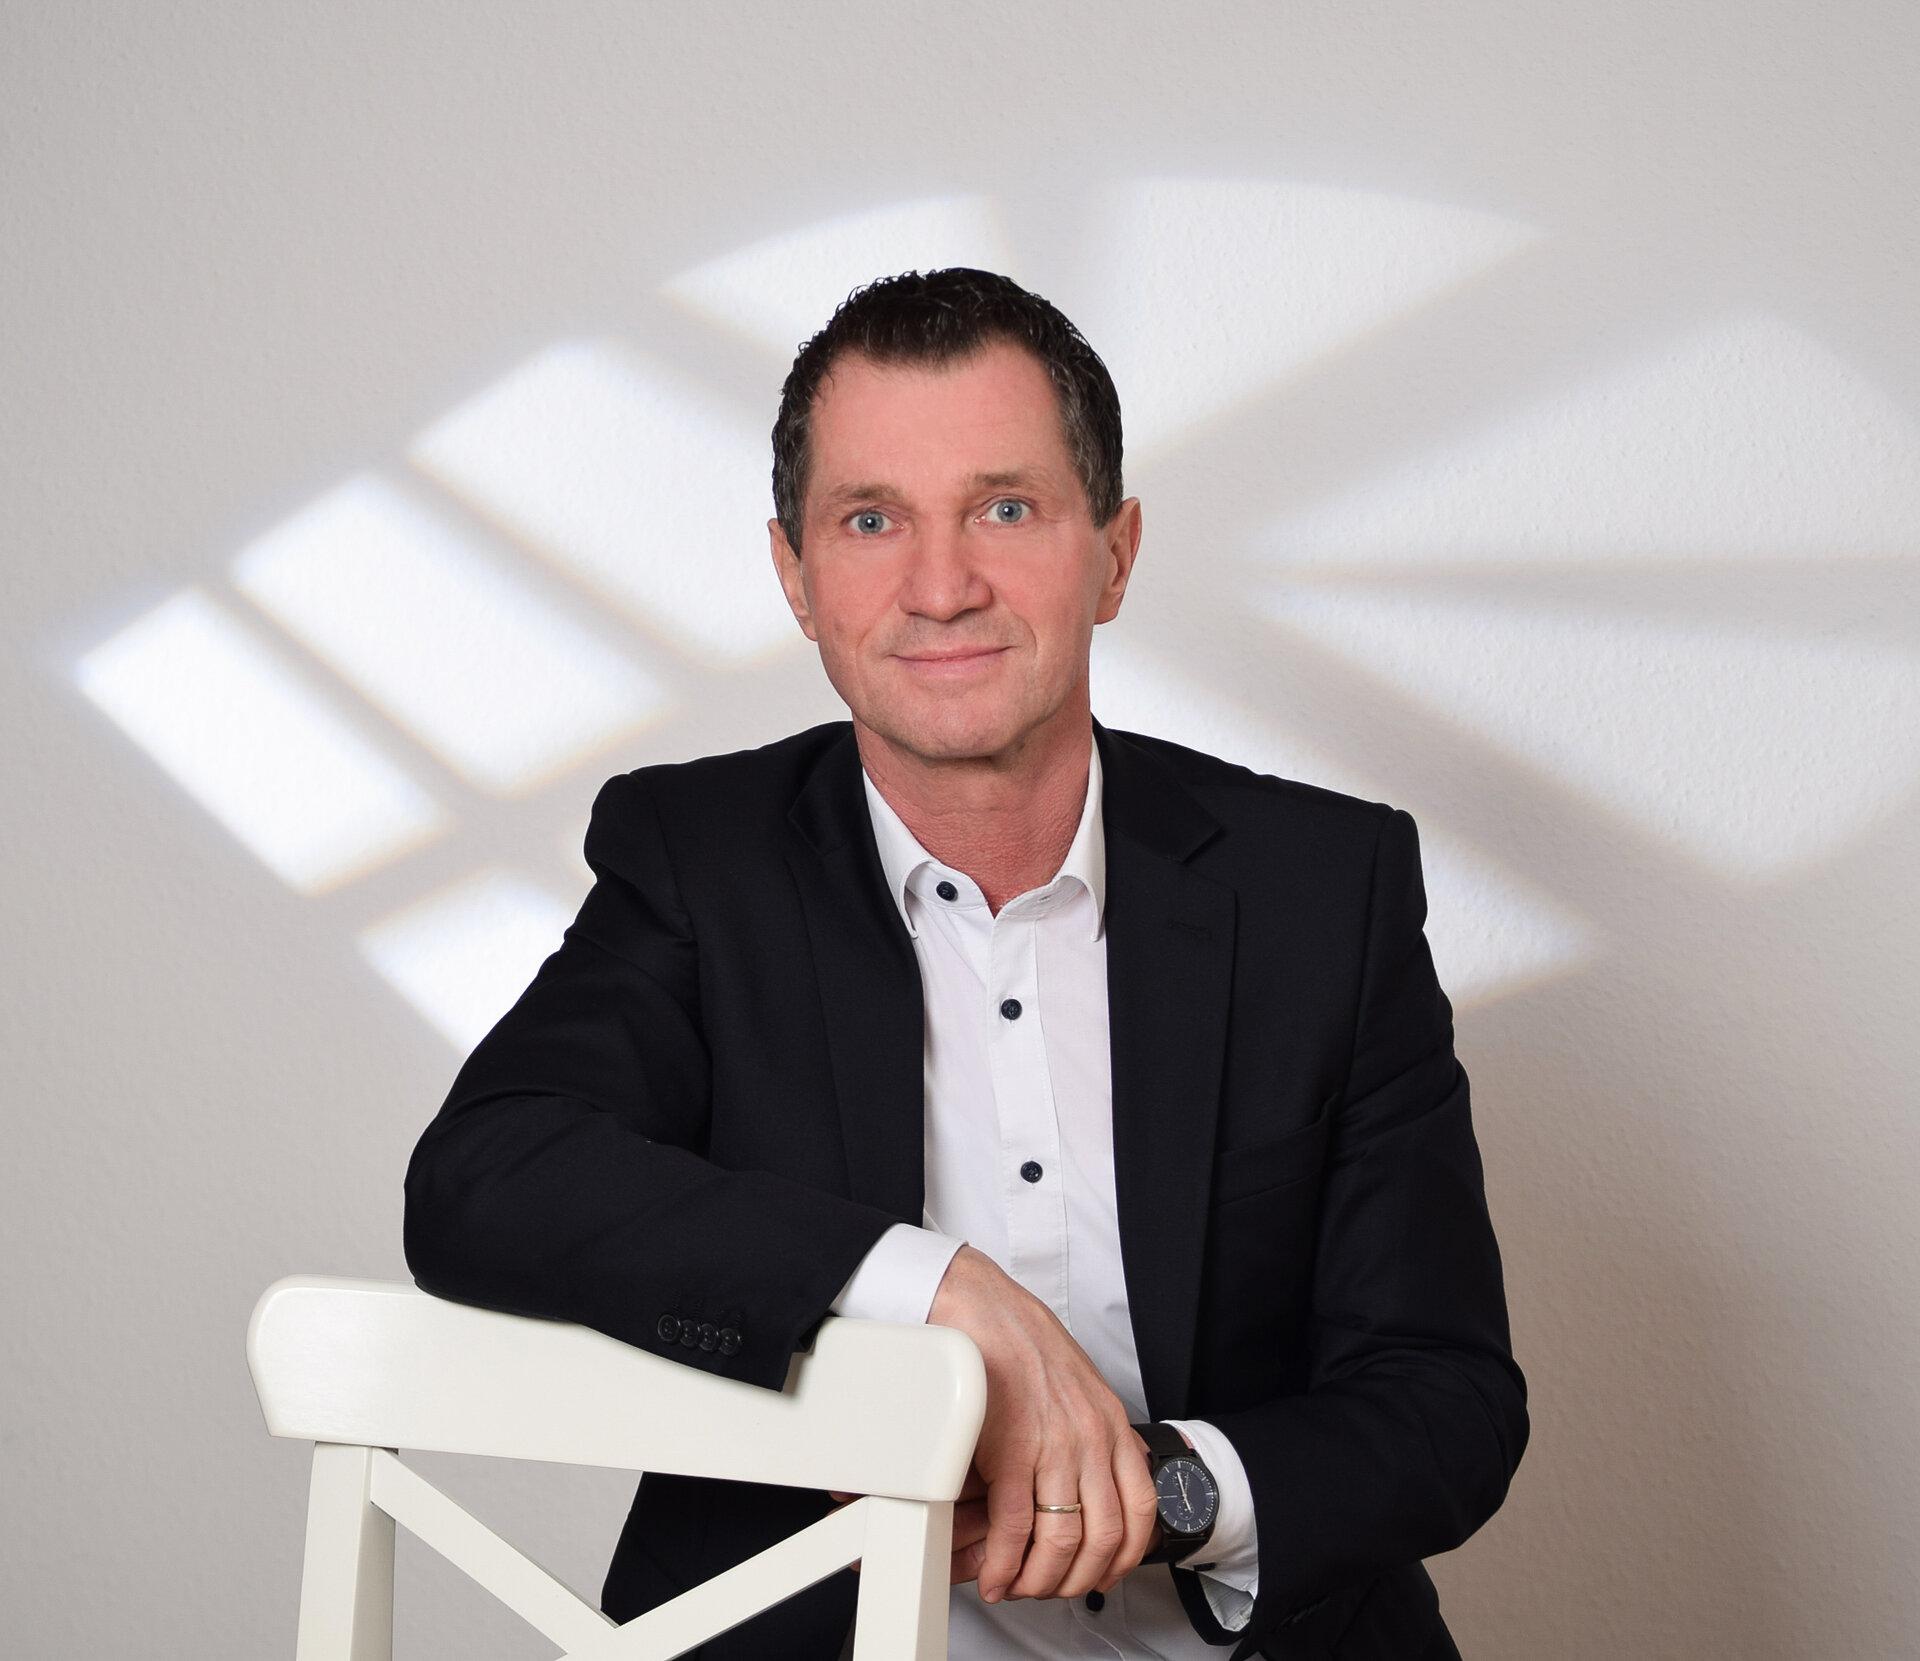 Bürgermeister Ralf Lehmann, Copyright Marlis Prawitz